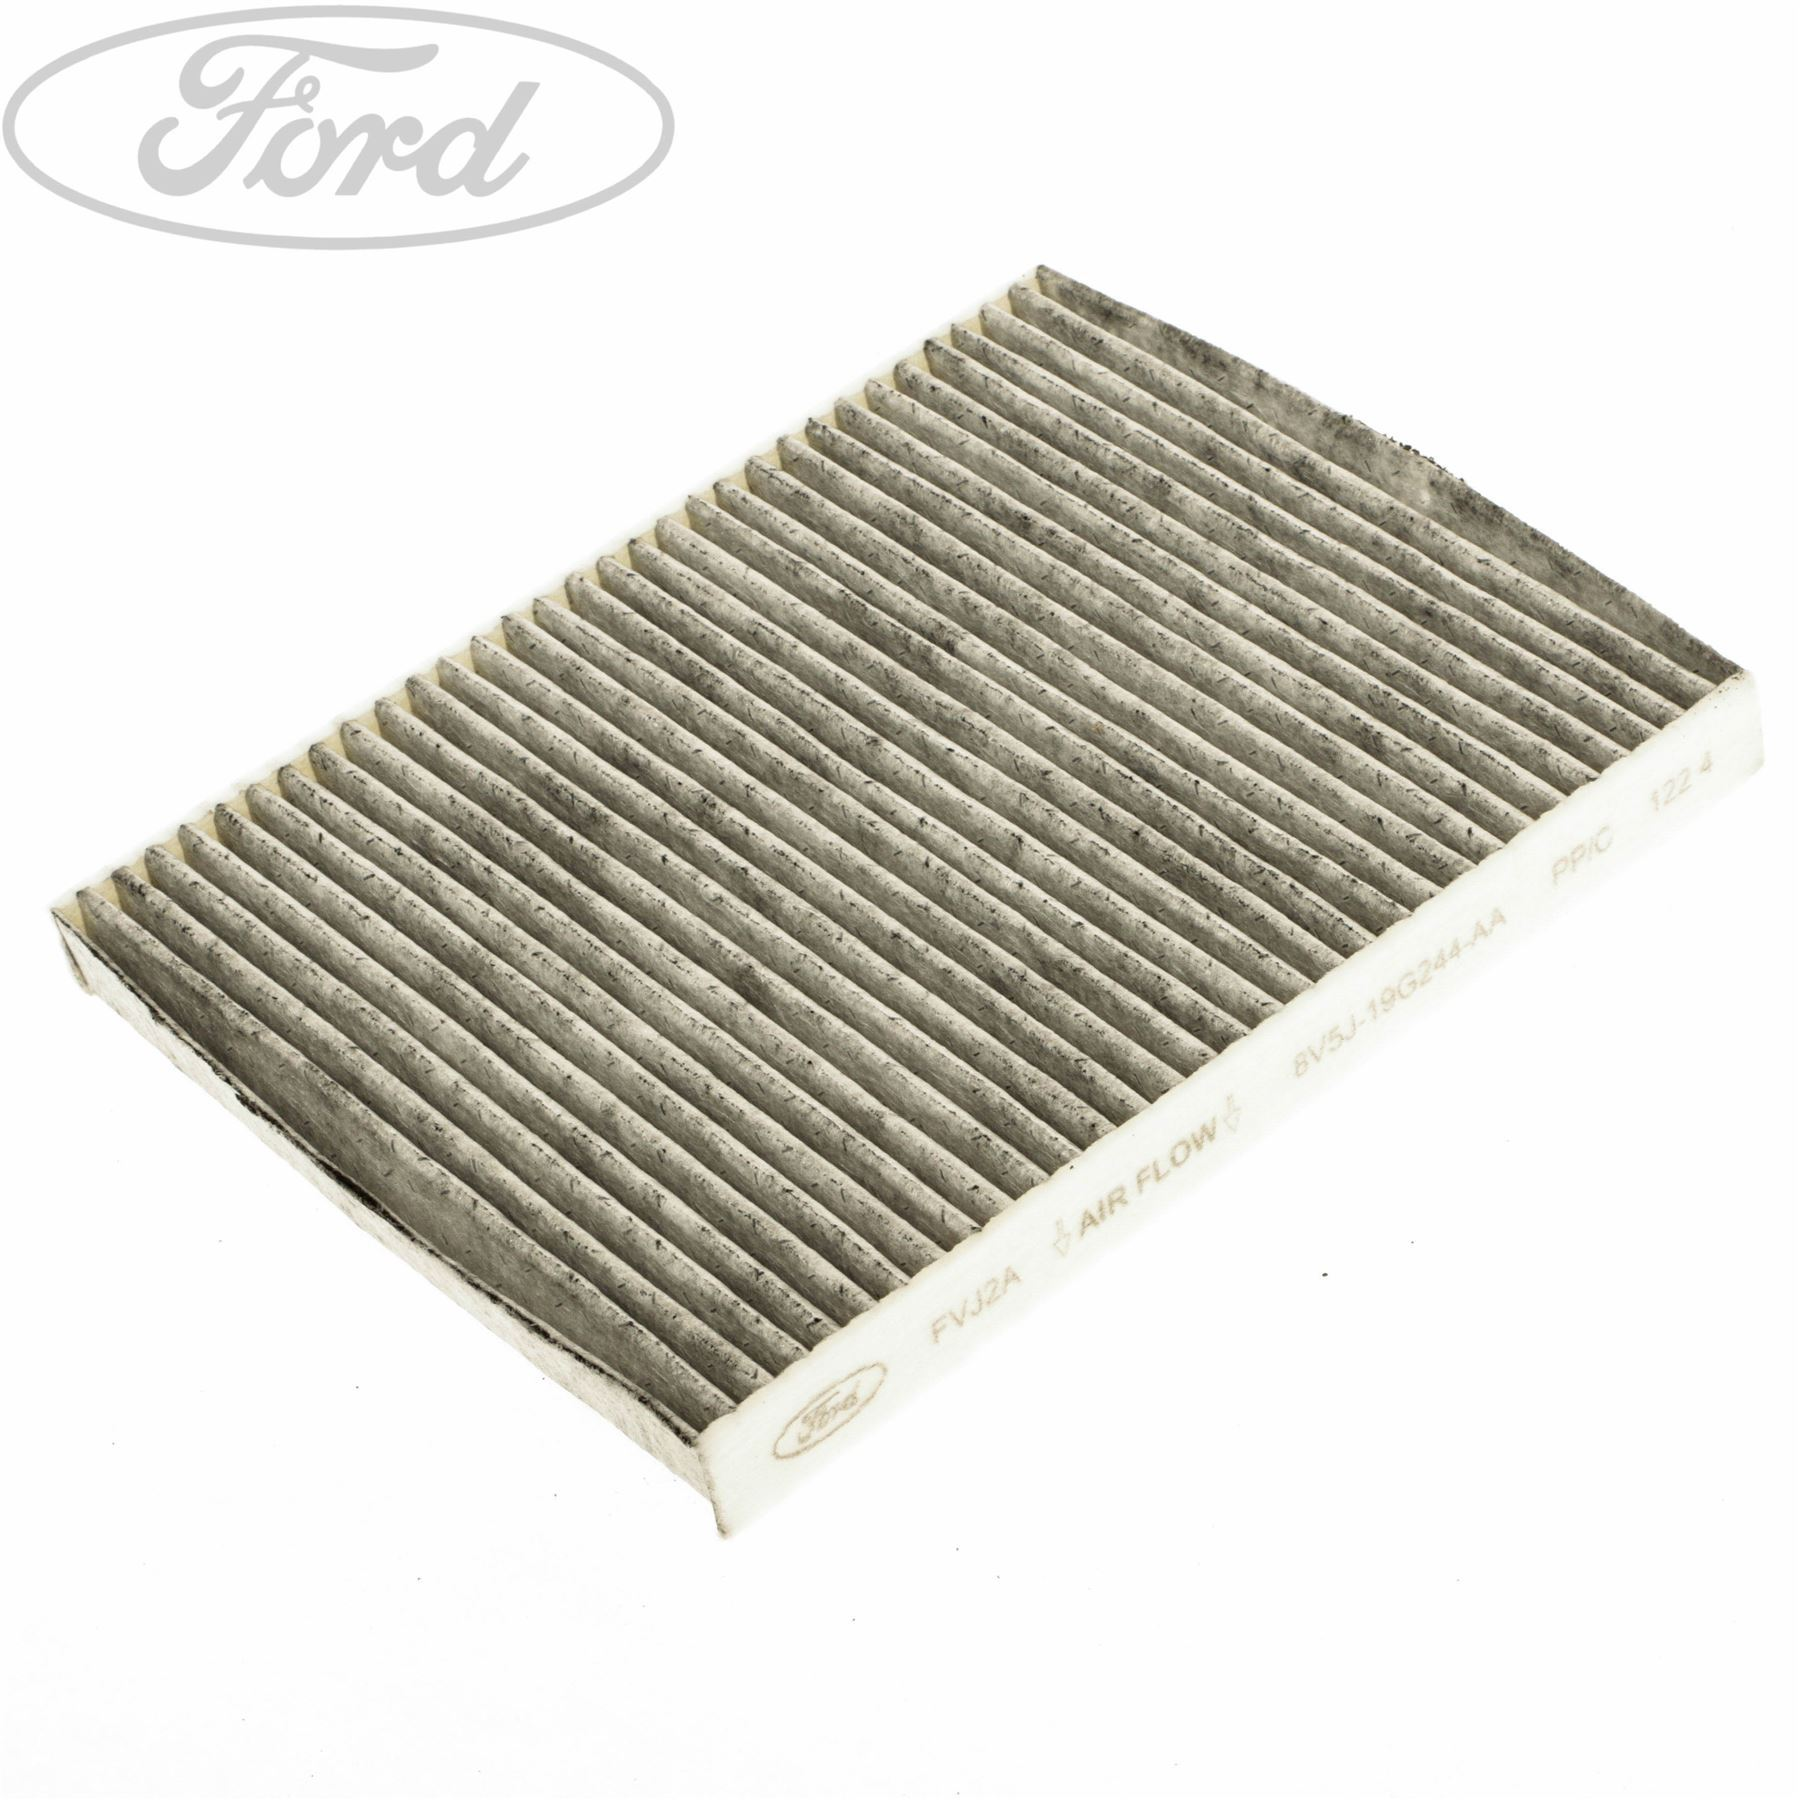 hight resolution of details about genuine ford fiesta mk7 mk8 b max carbon cabin pollen odour filter 1566997